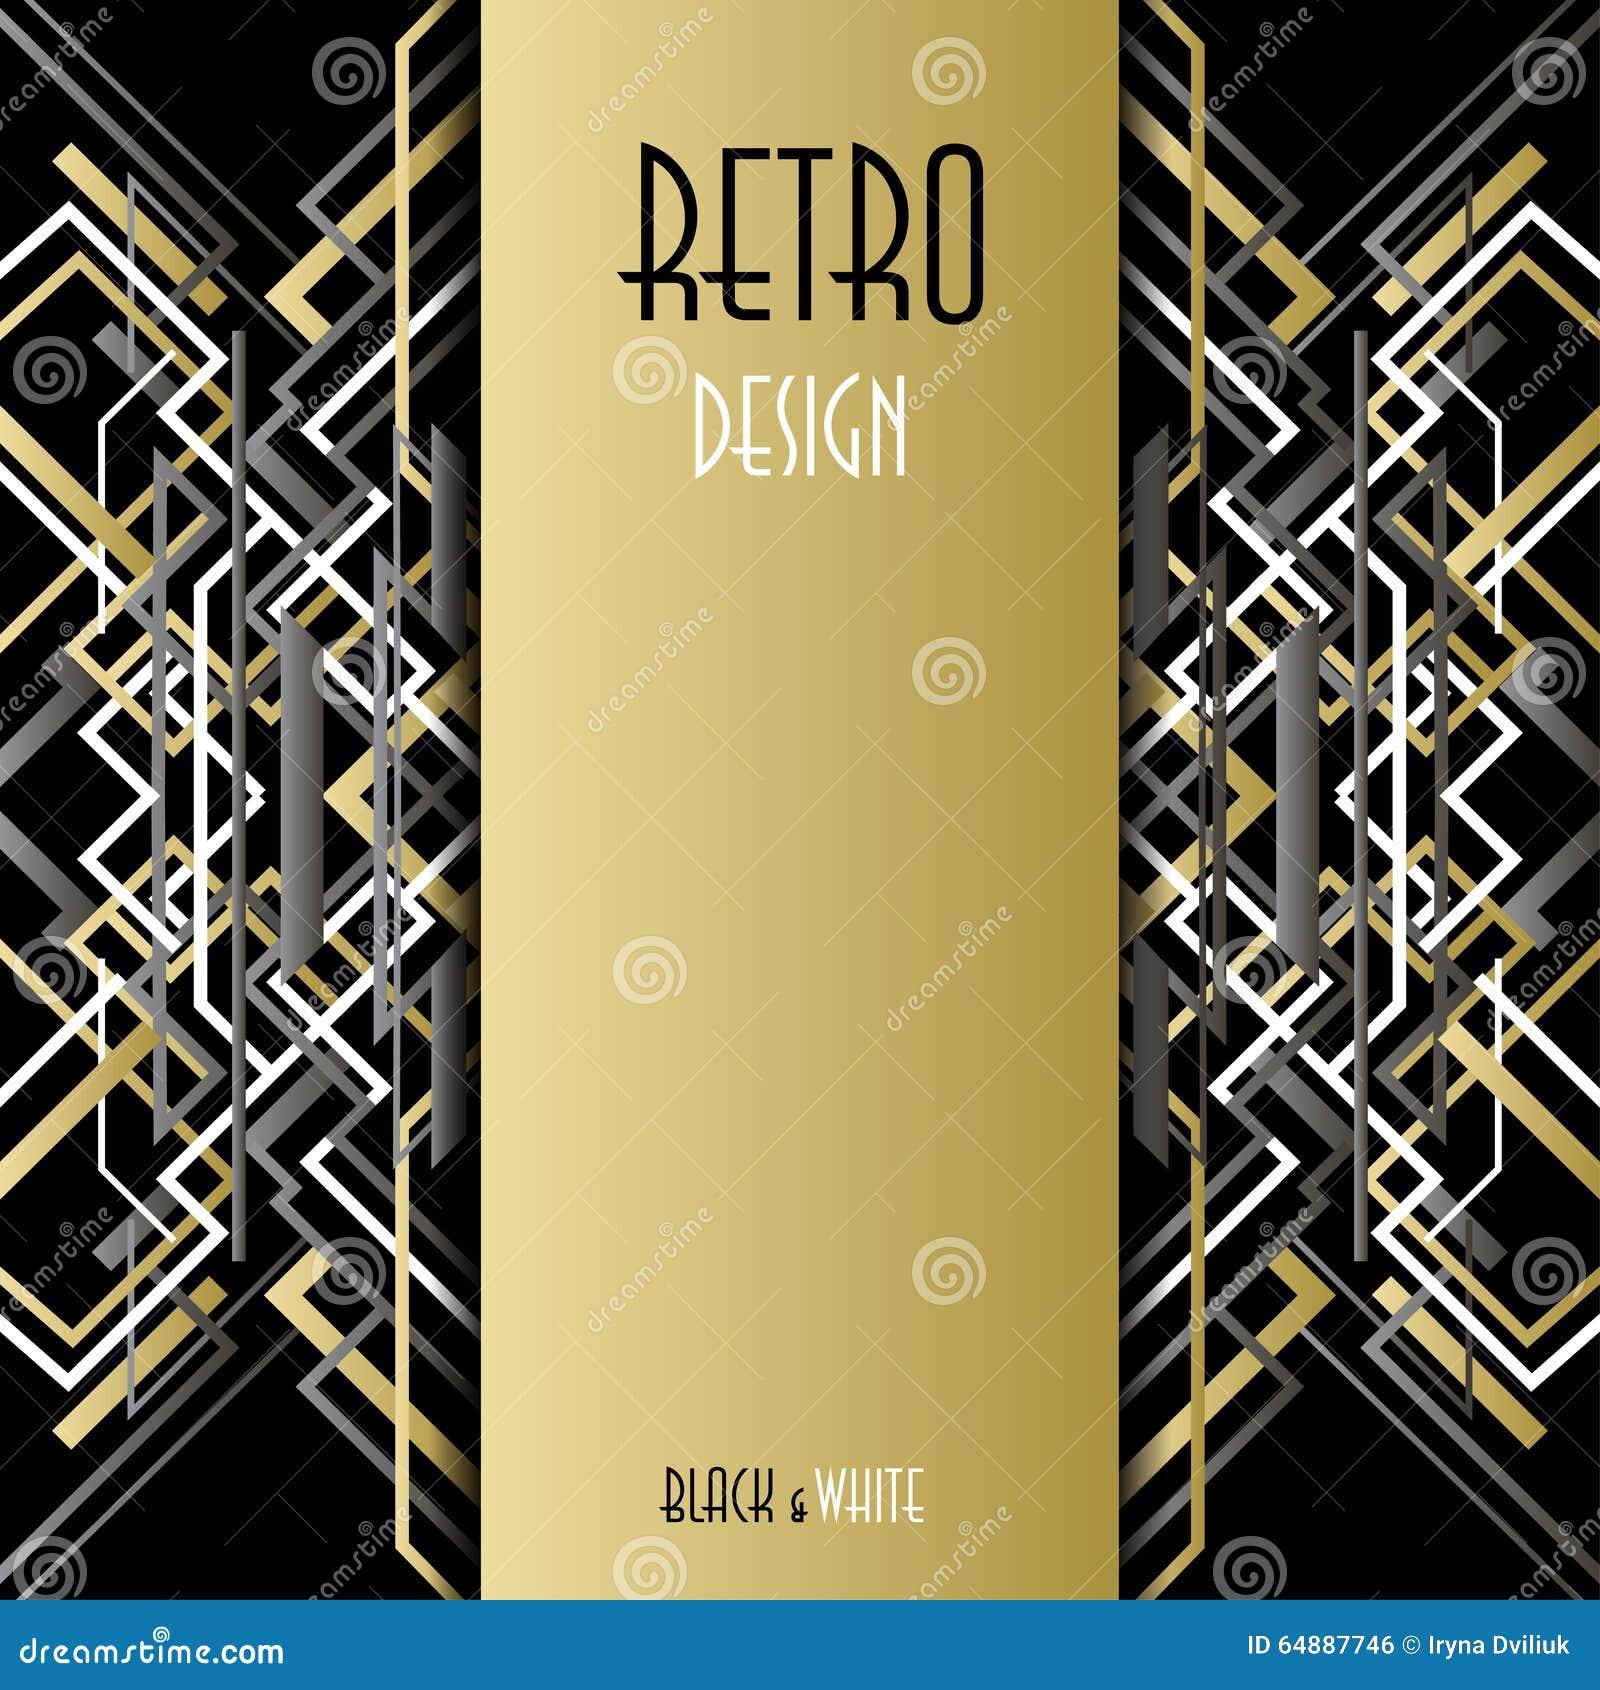 Background image vertical center - Background With Golden Silver Black Art Deco Outline Style Design Stock Vector